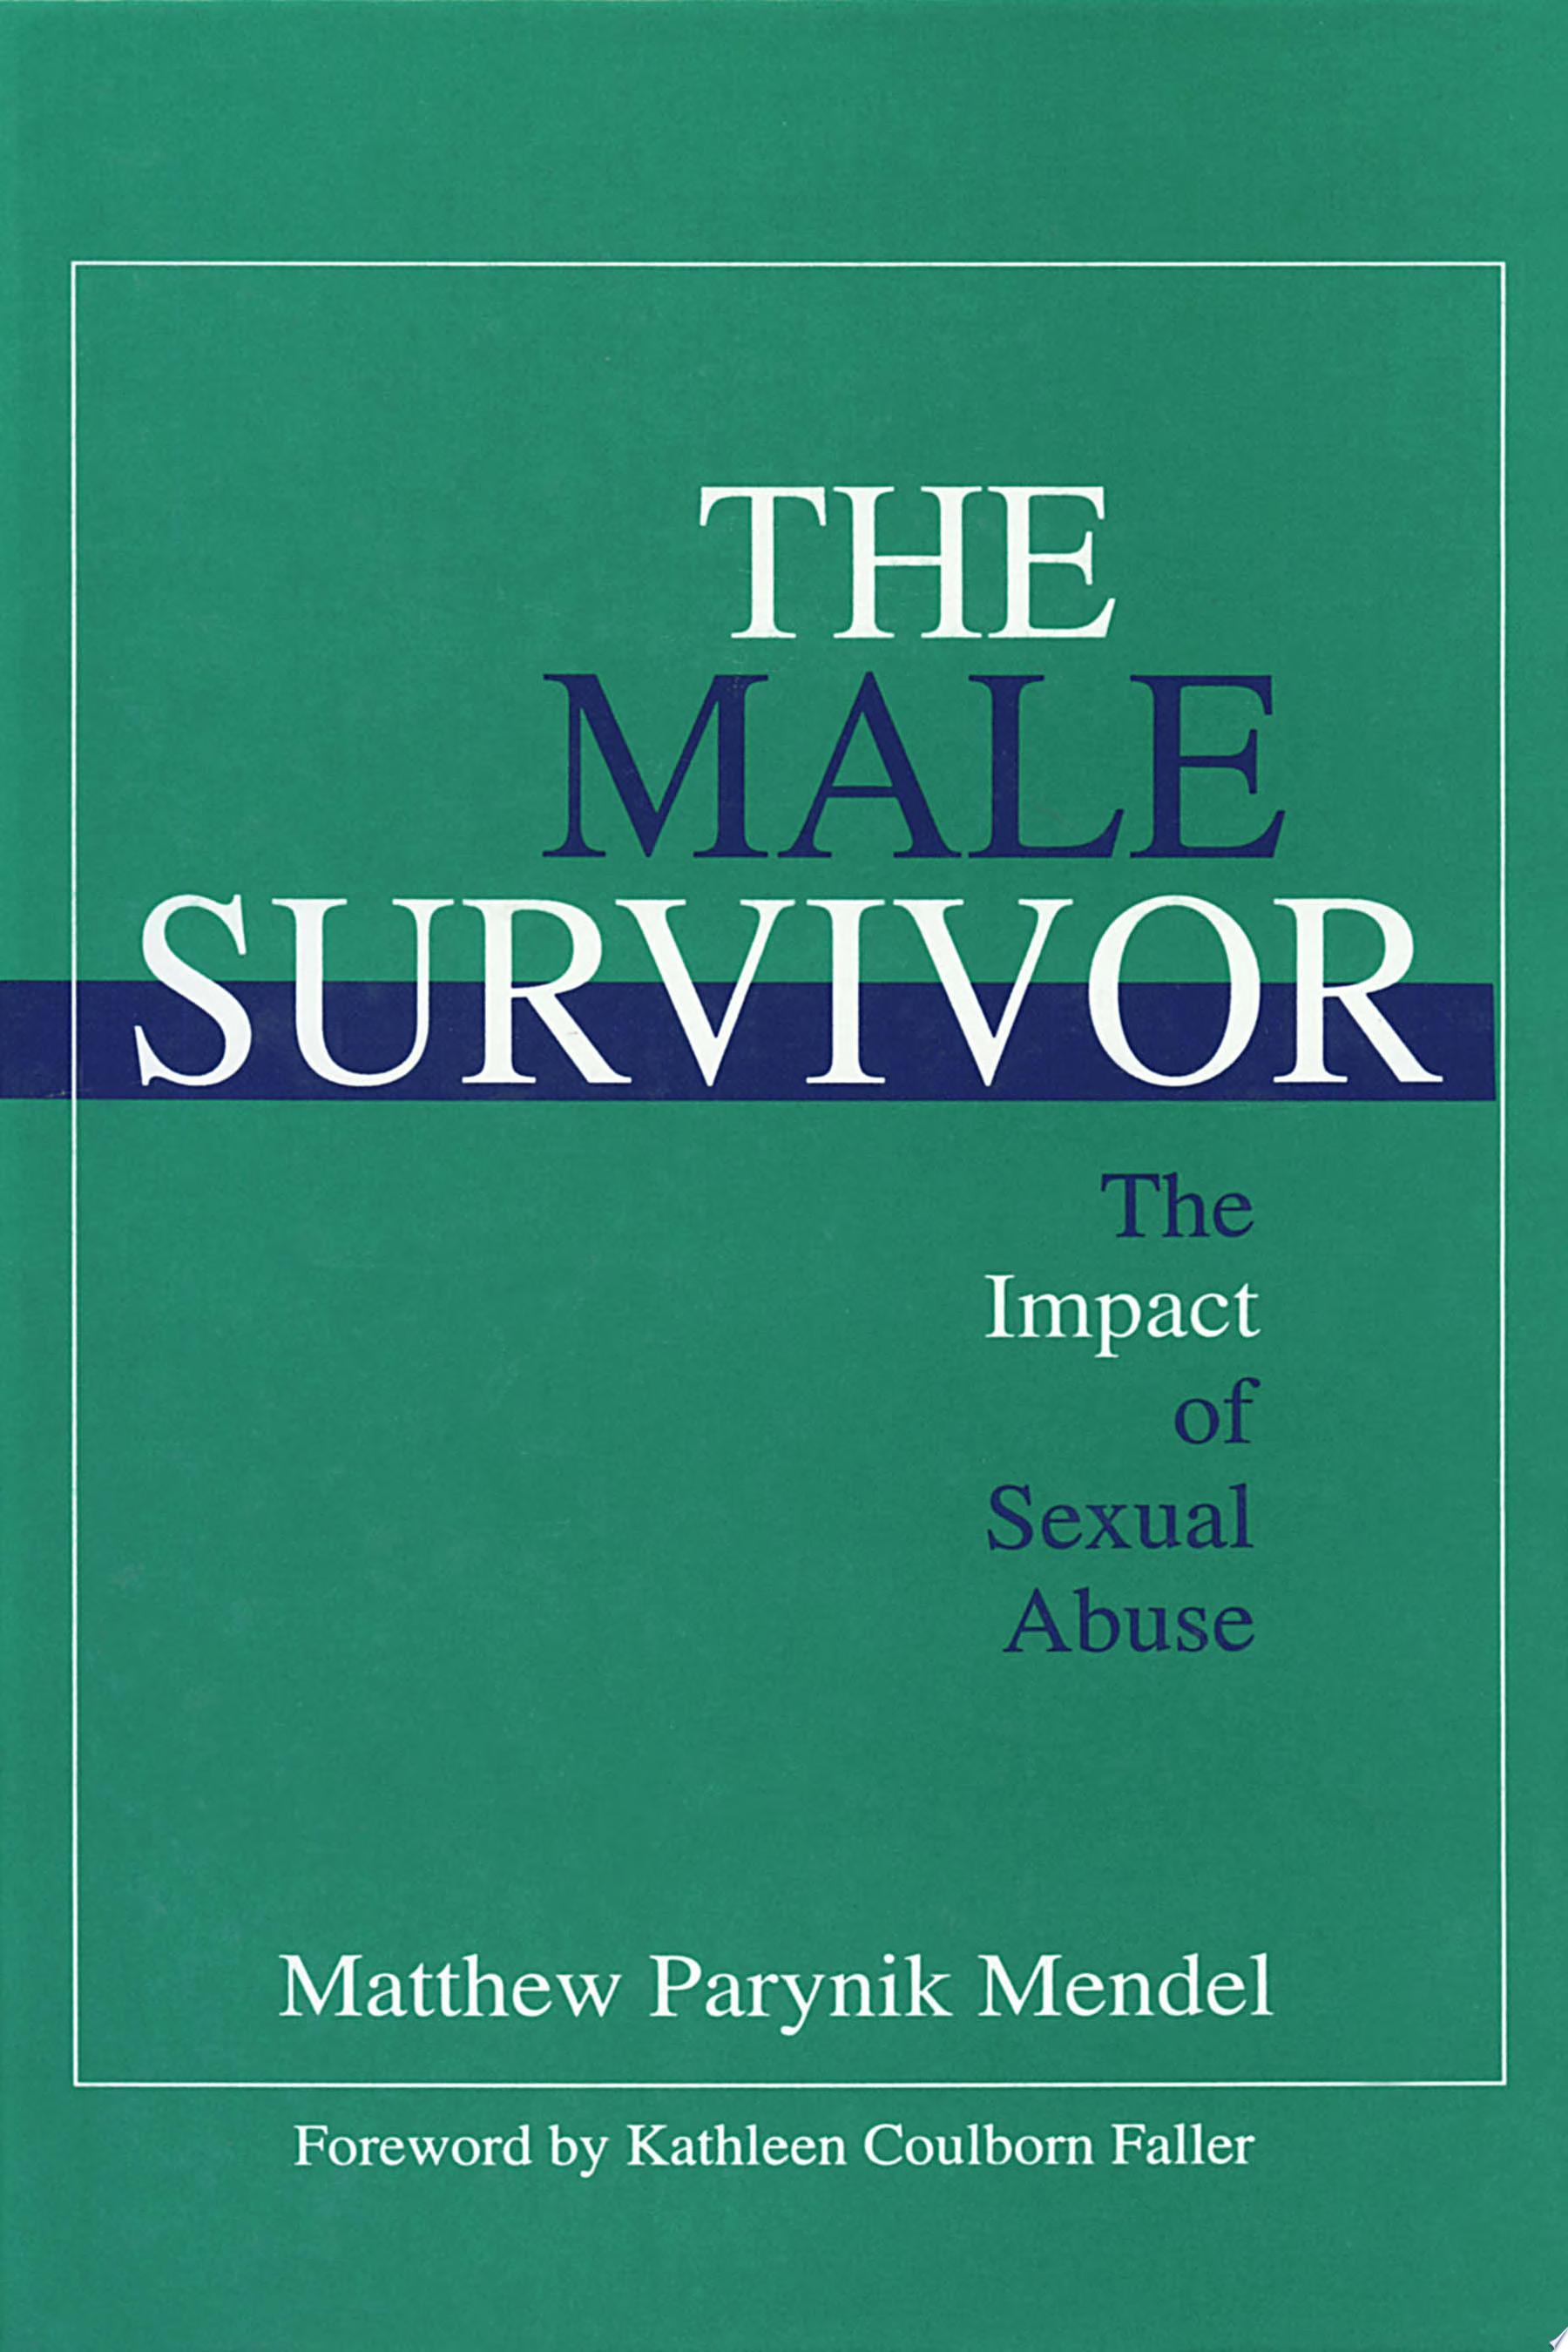 The Male Survivor